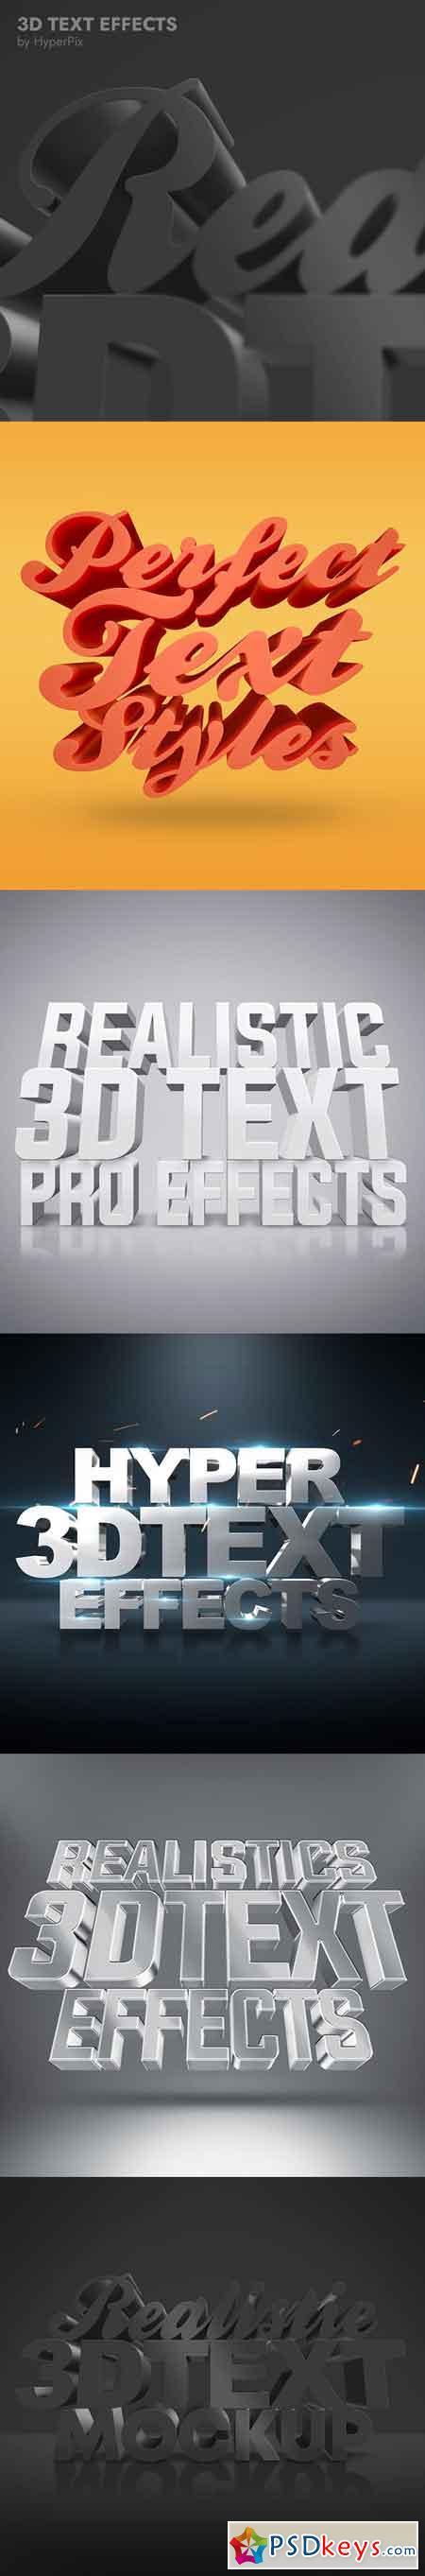 3D Text Effects 23101125